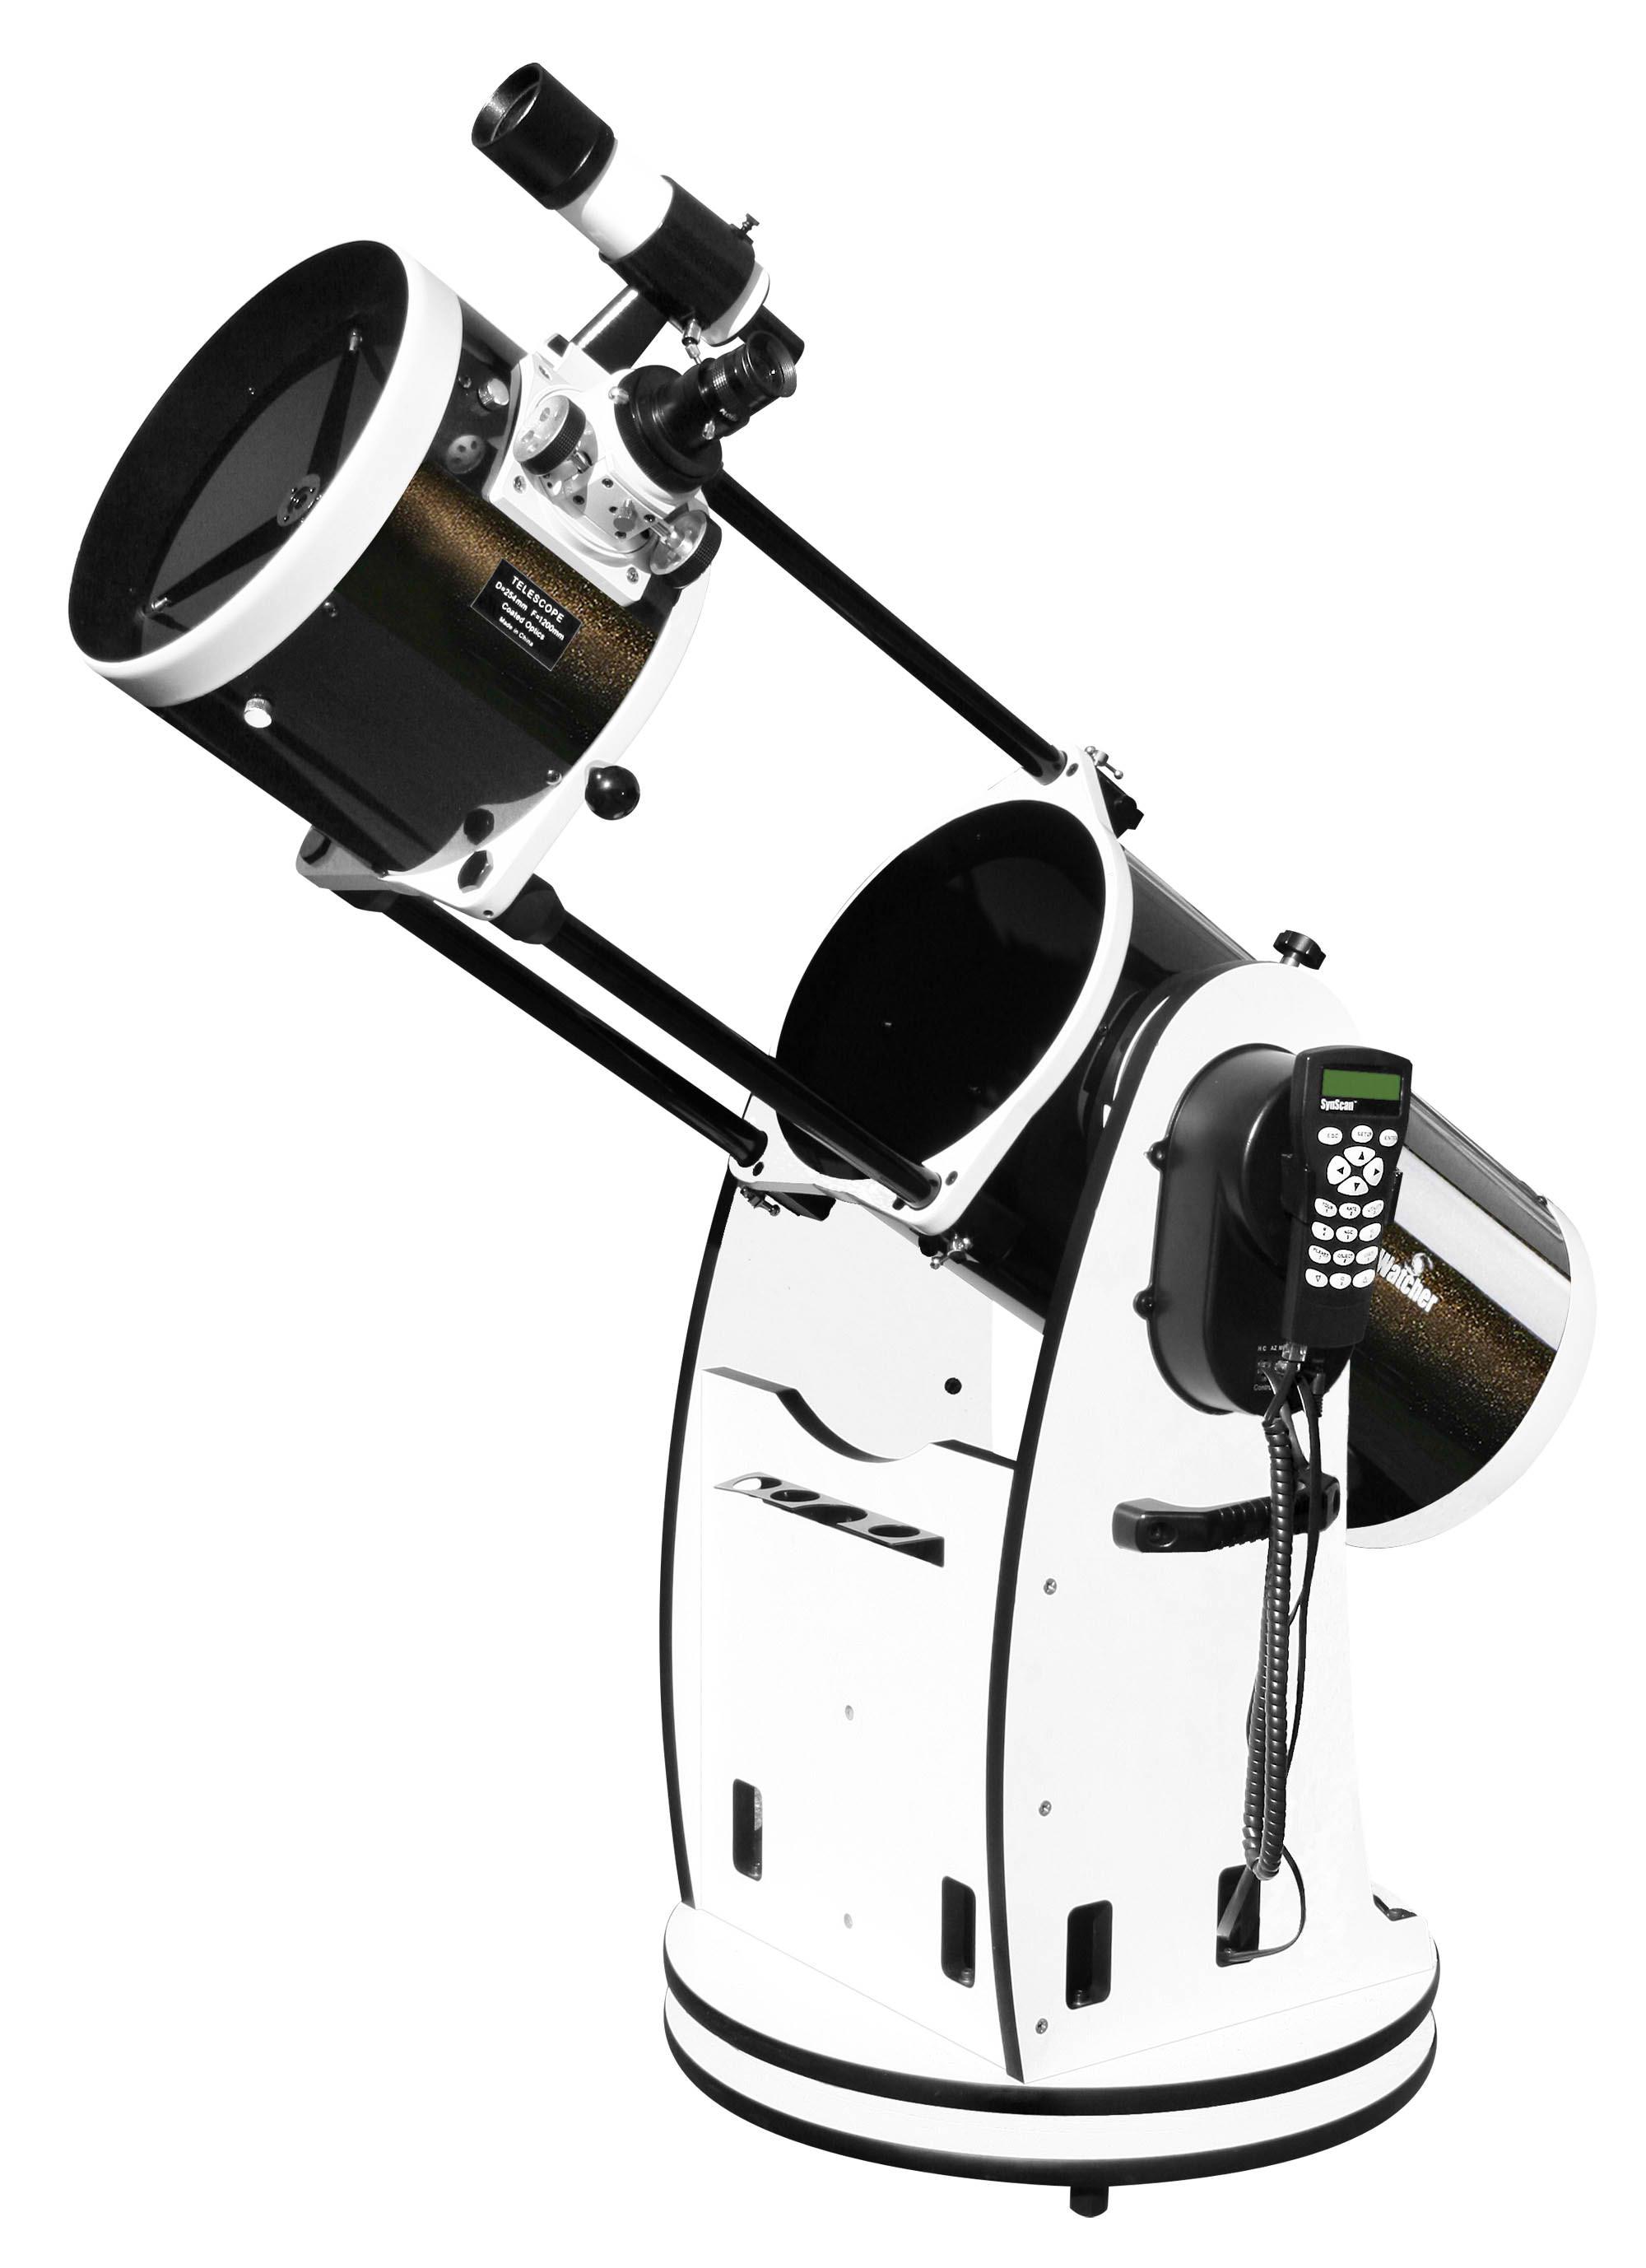 Skywatcher 10 inch f4.8 Newtonian Reflector on a GoTo Dobsonian Mount